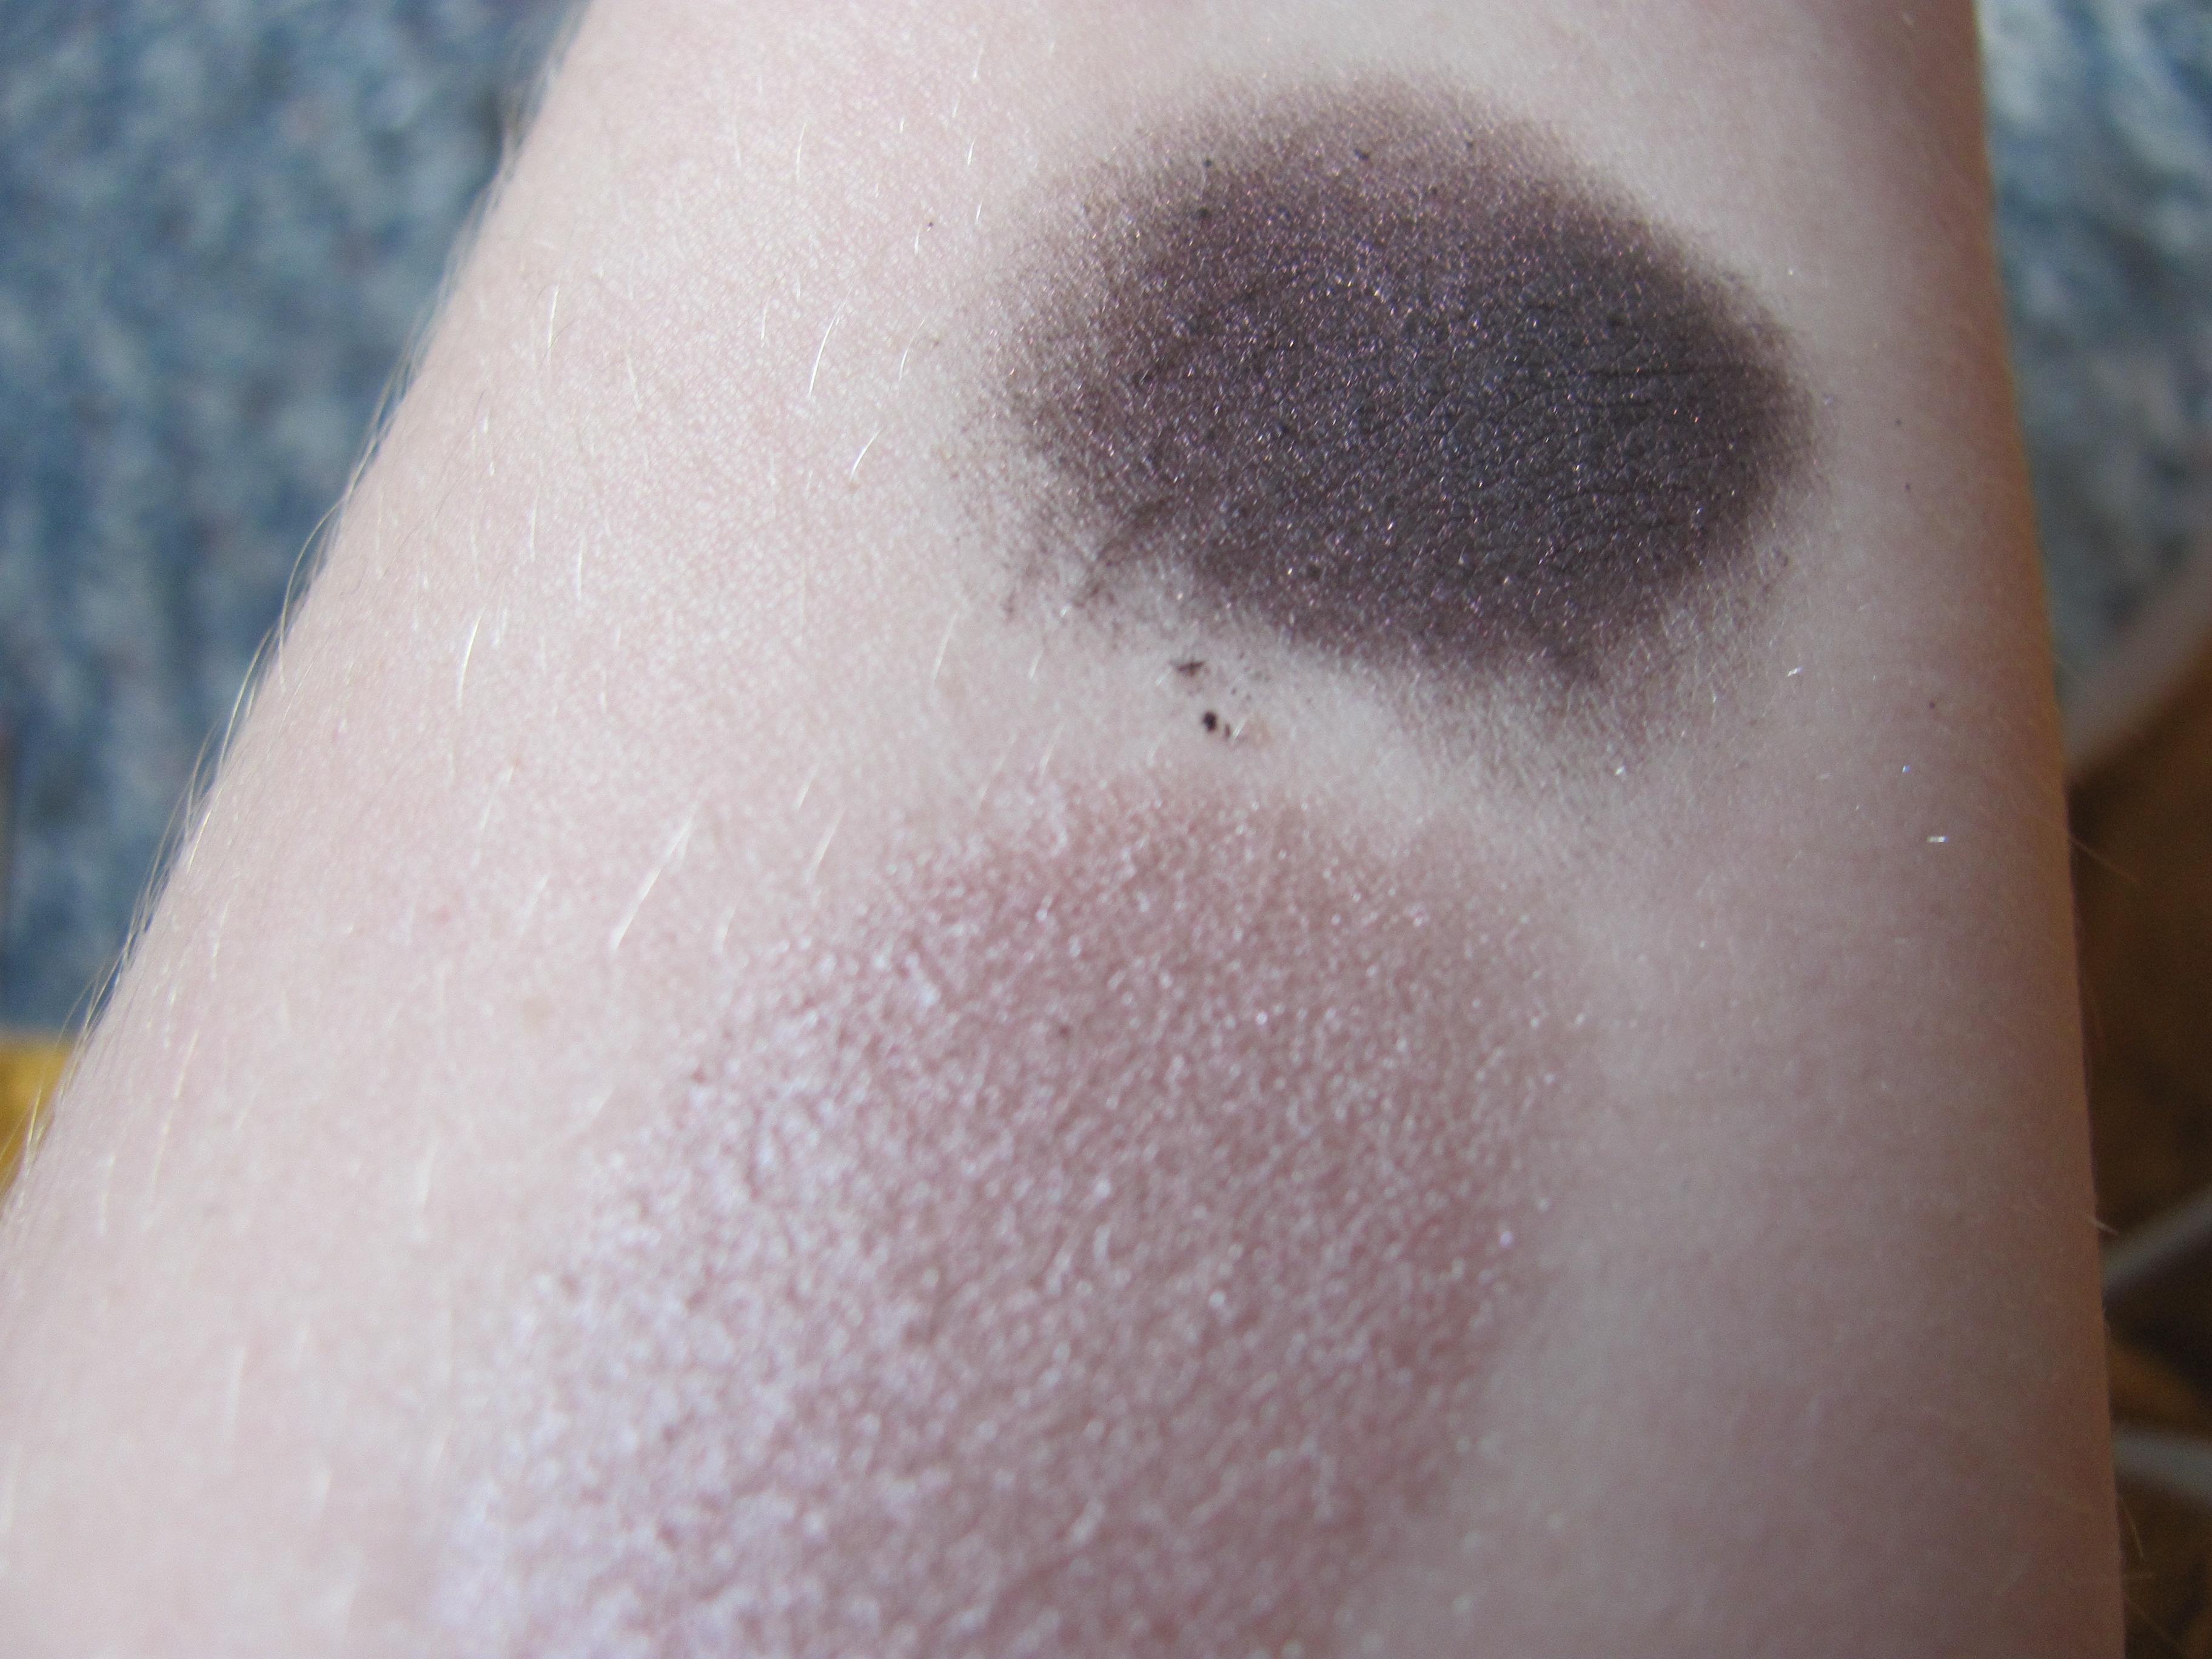 Gray Spots On Skin - Doctor insights on HealthTap